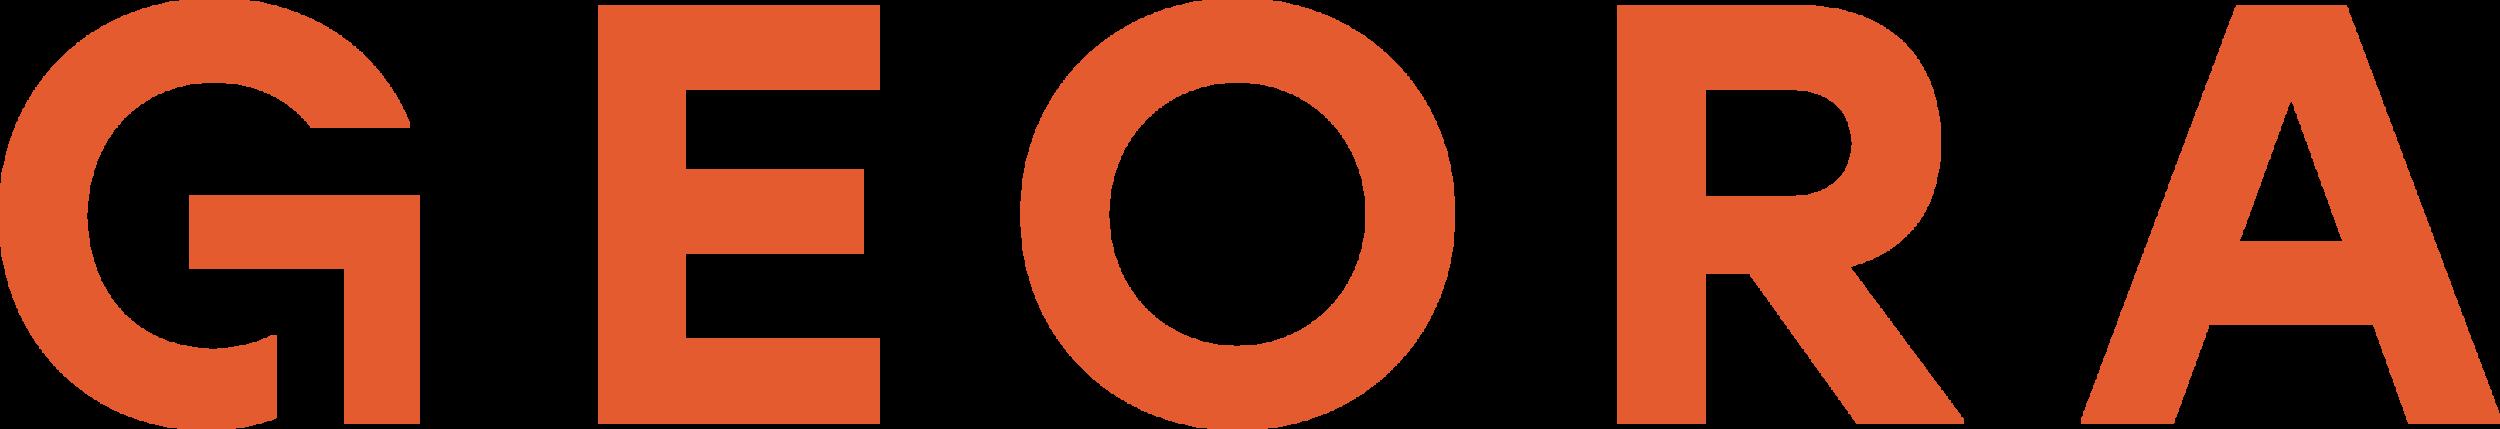 Geora_Logo_AI-03.png